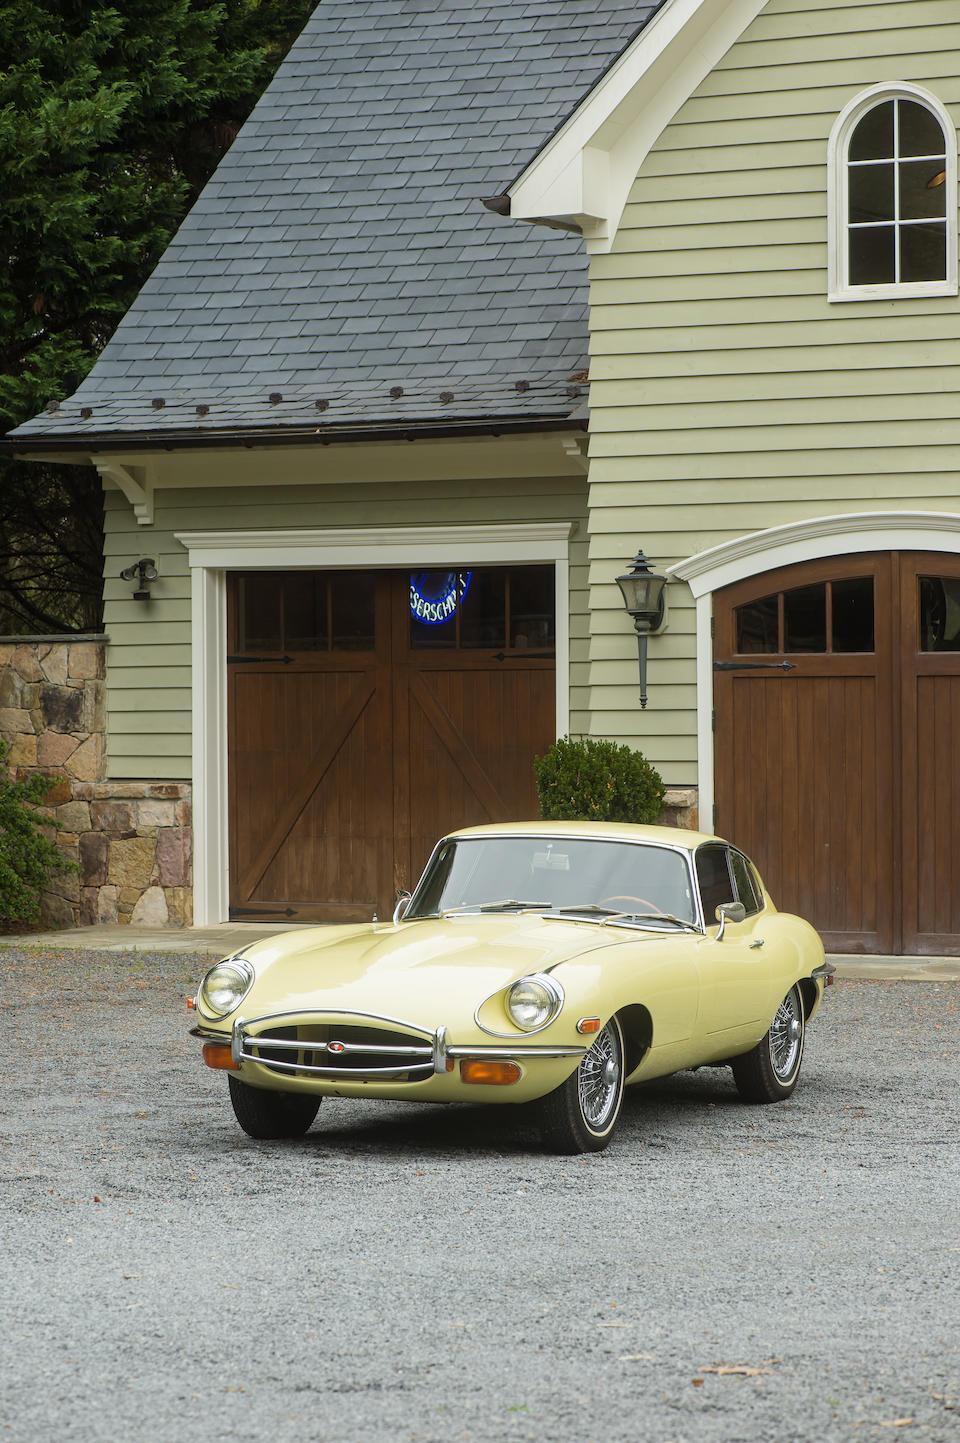 <b>1969 Jaguar E-TYPE SERIES 2 4.2-LITER COUPE</b><br />Chassis no. 1R25351<br />Engine no. 7R2113-9